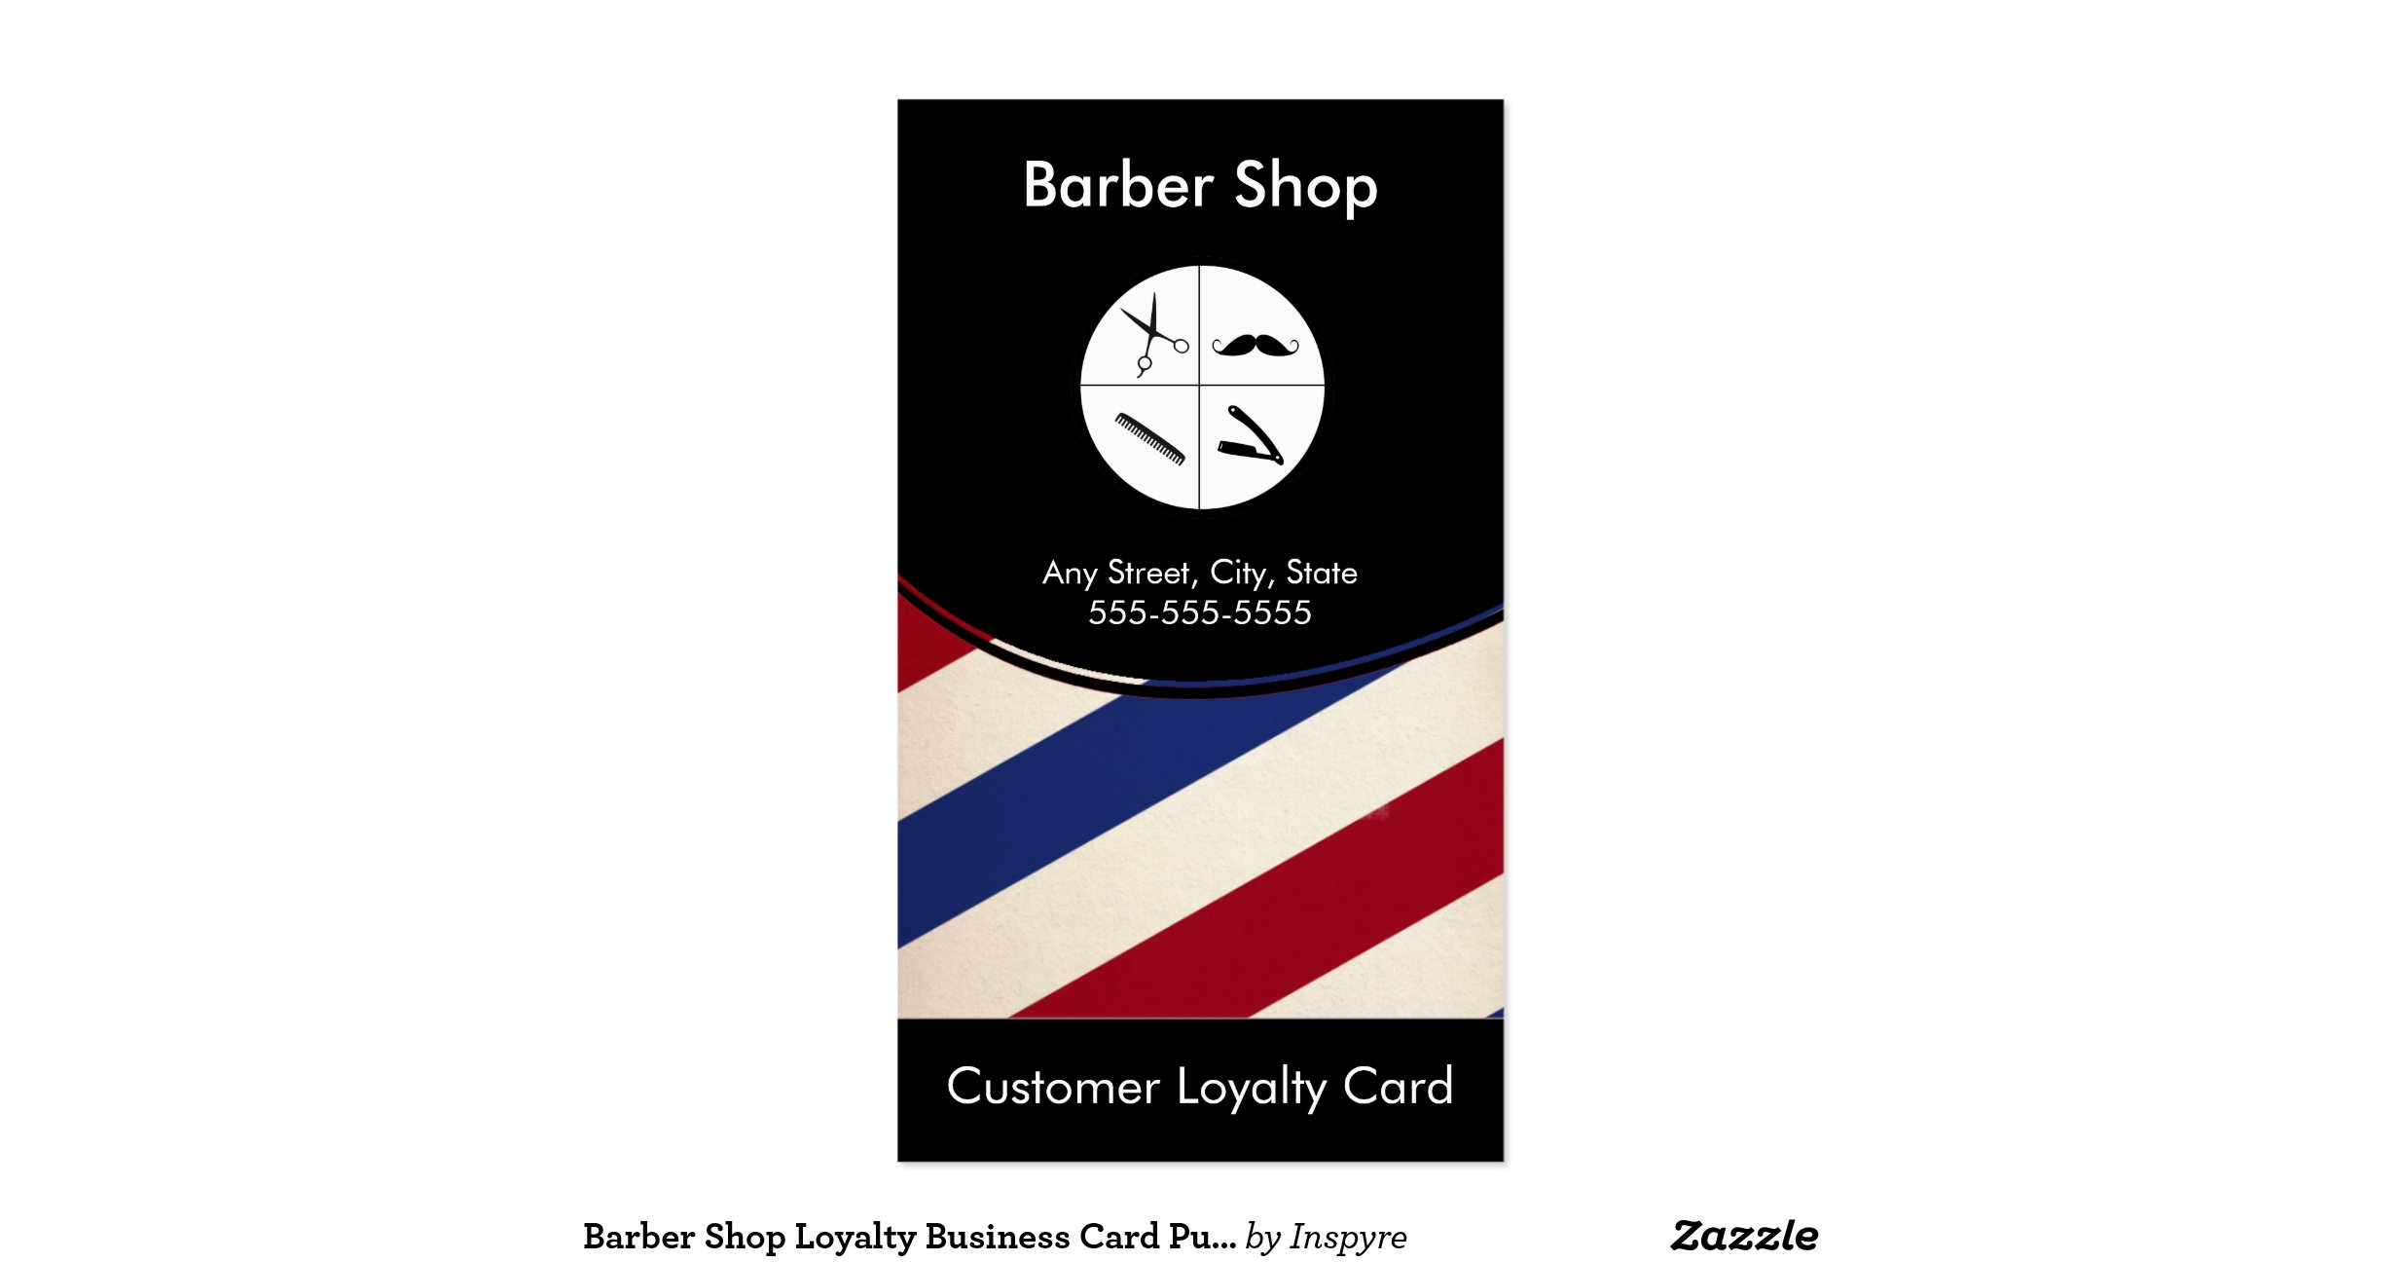 Barbershoployaltybusinesscardpunchcard